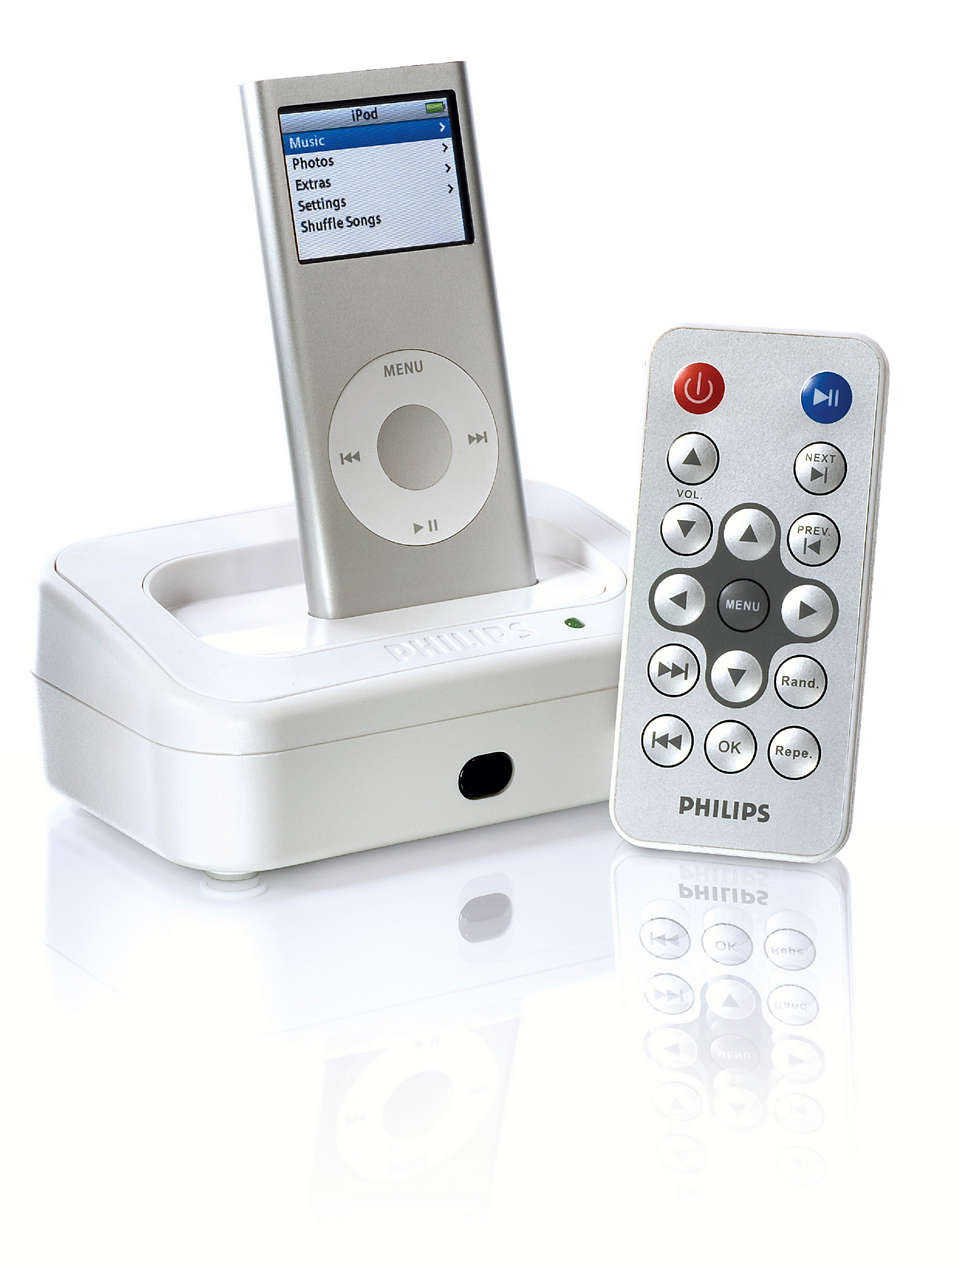 Docka din iPod